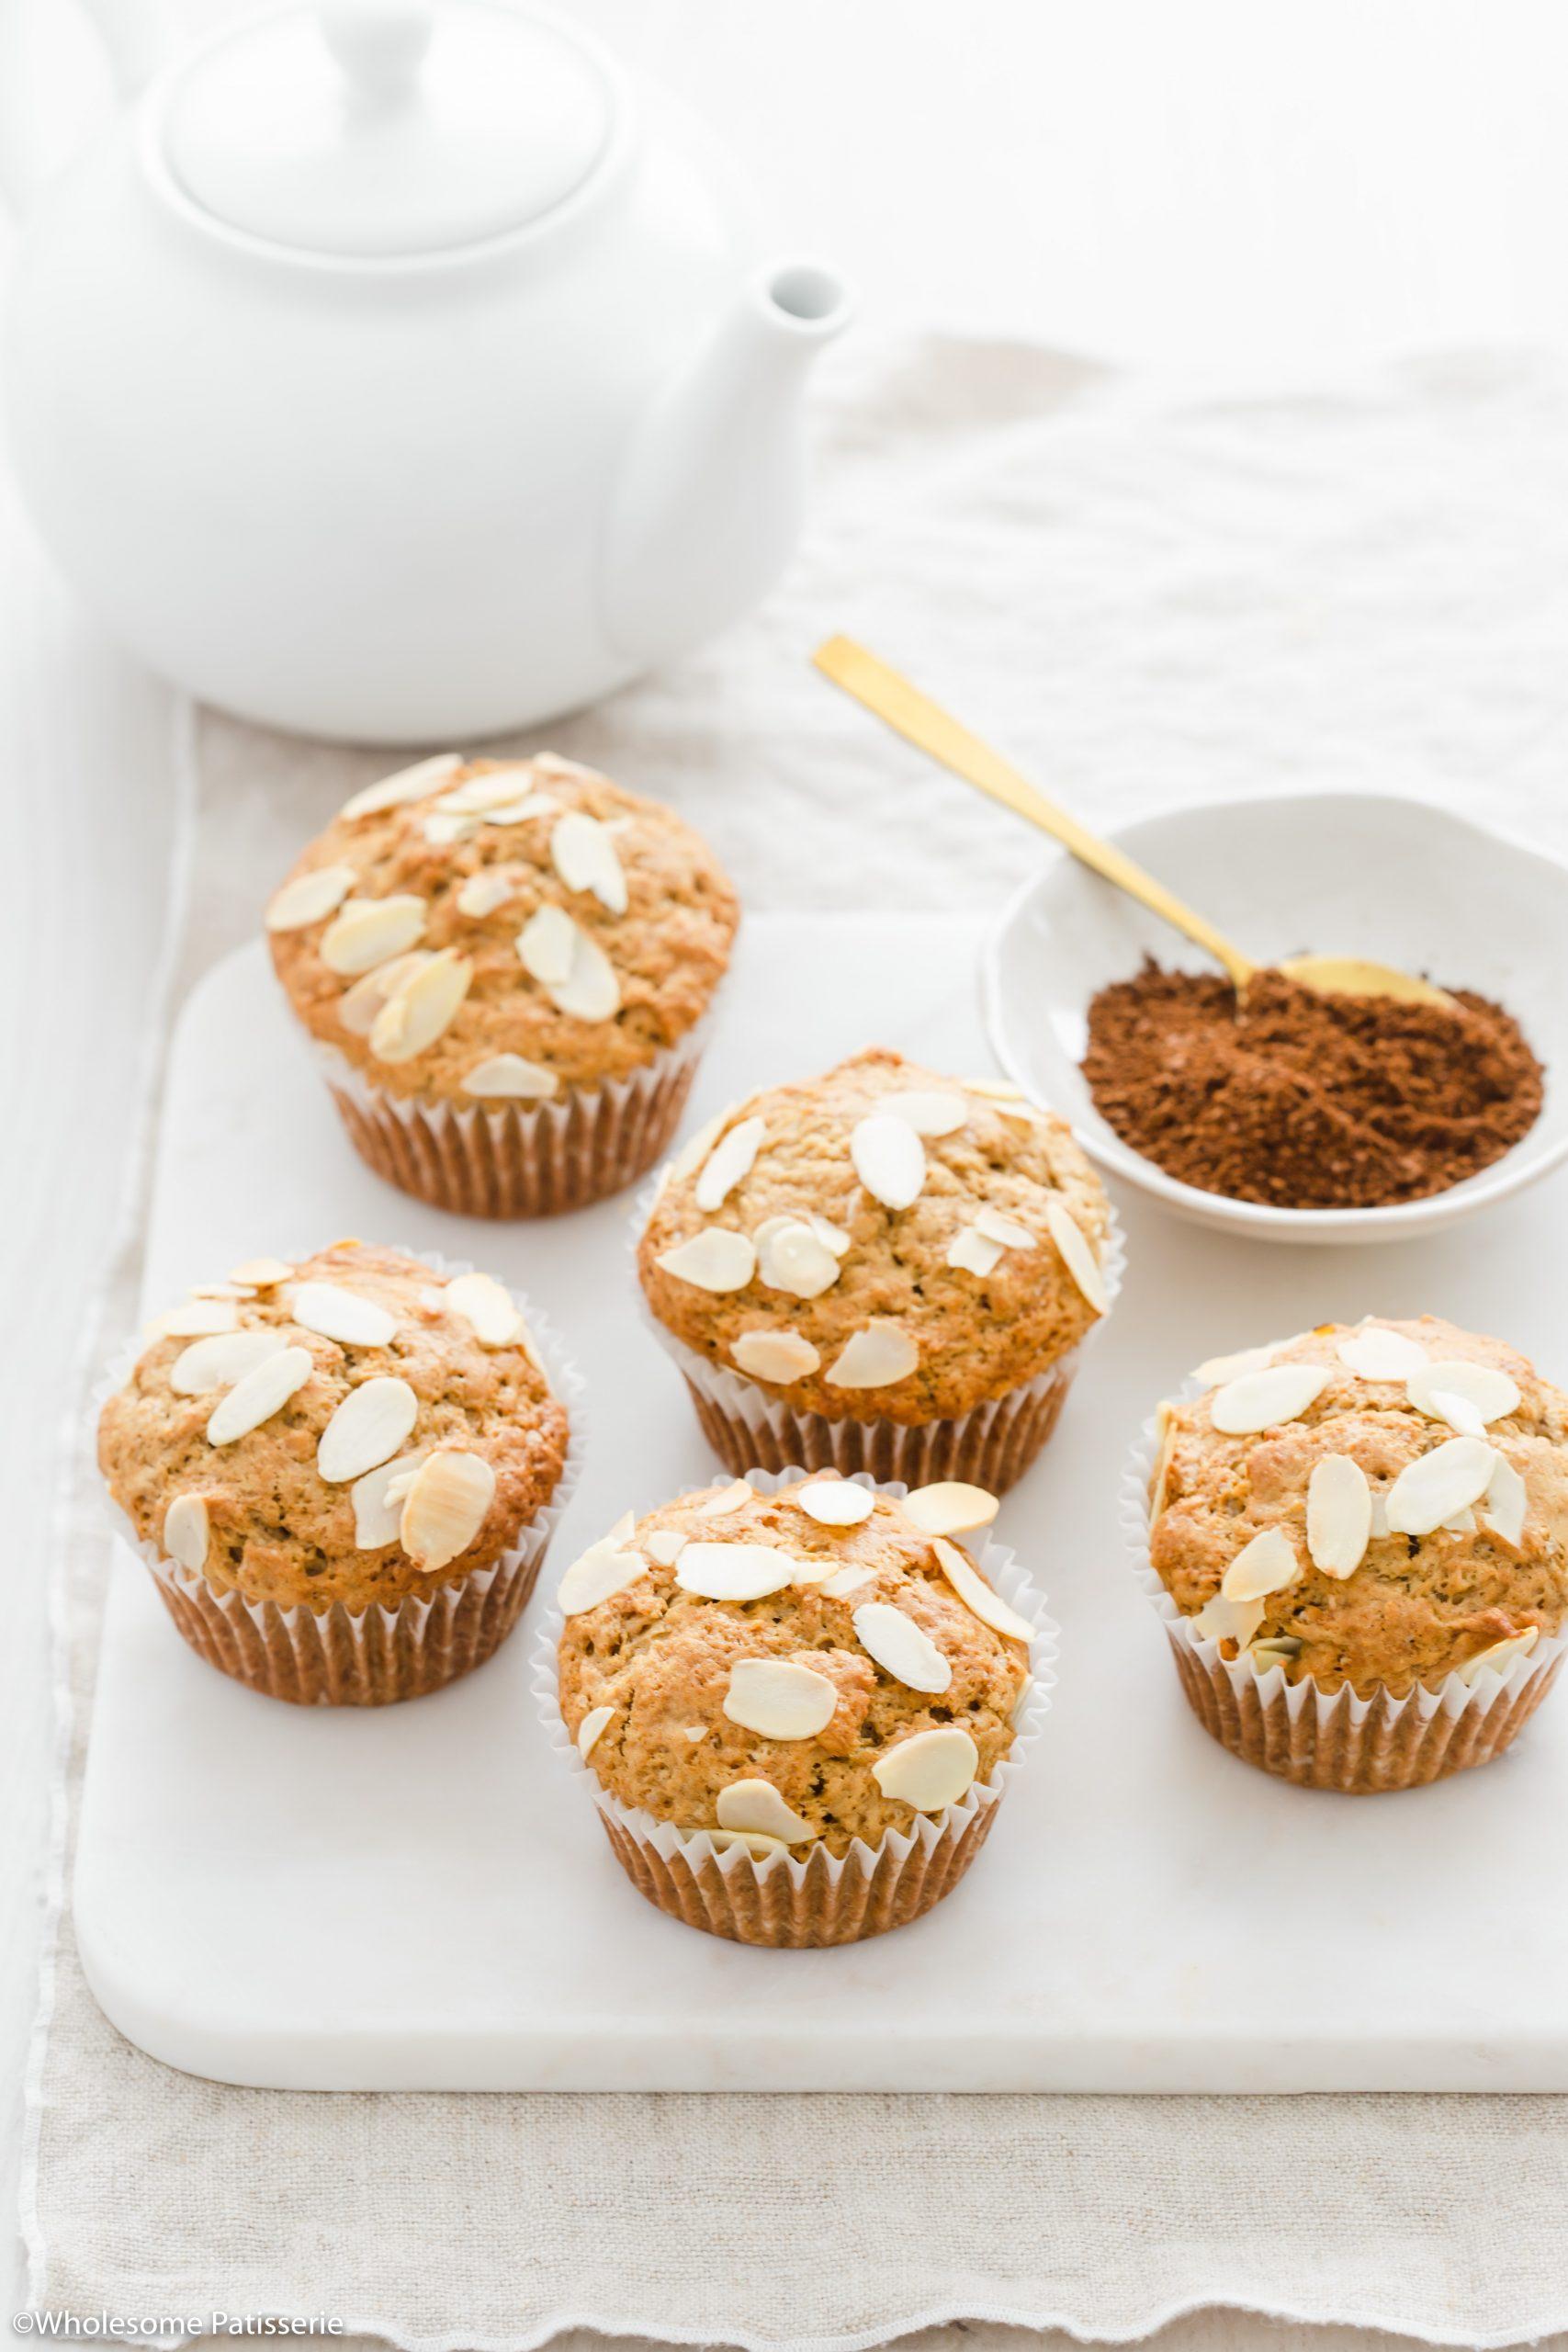 Coffee & Almond Muffins